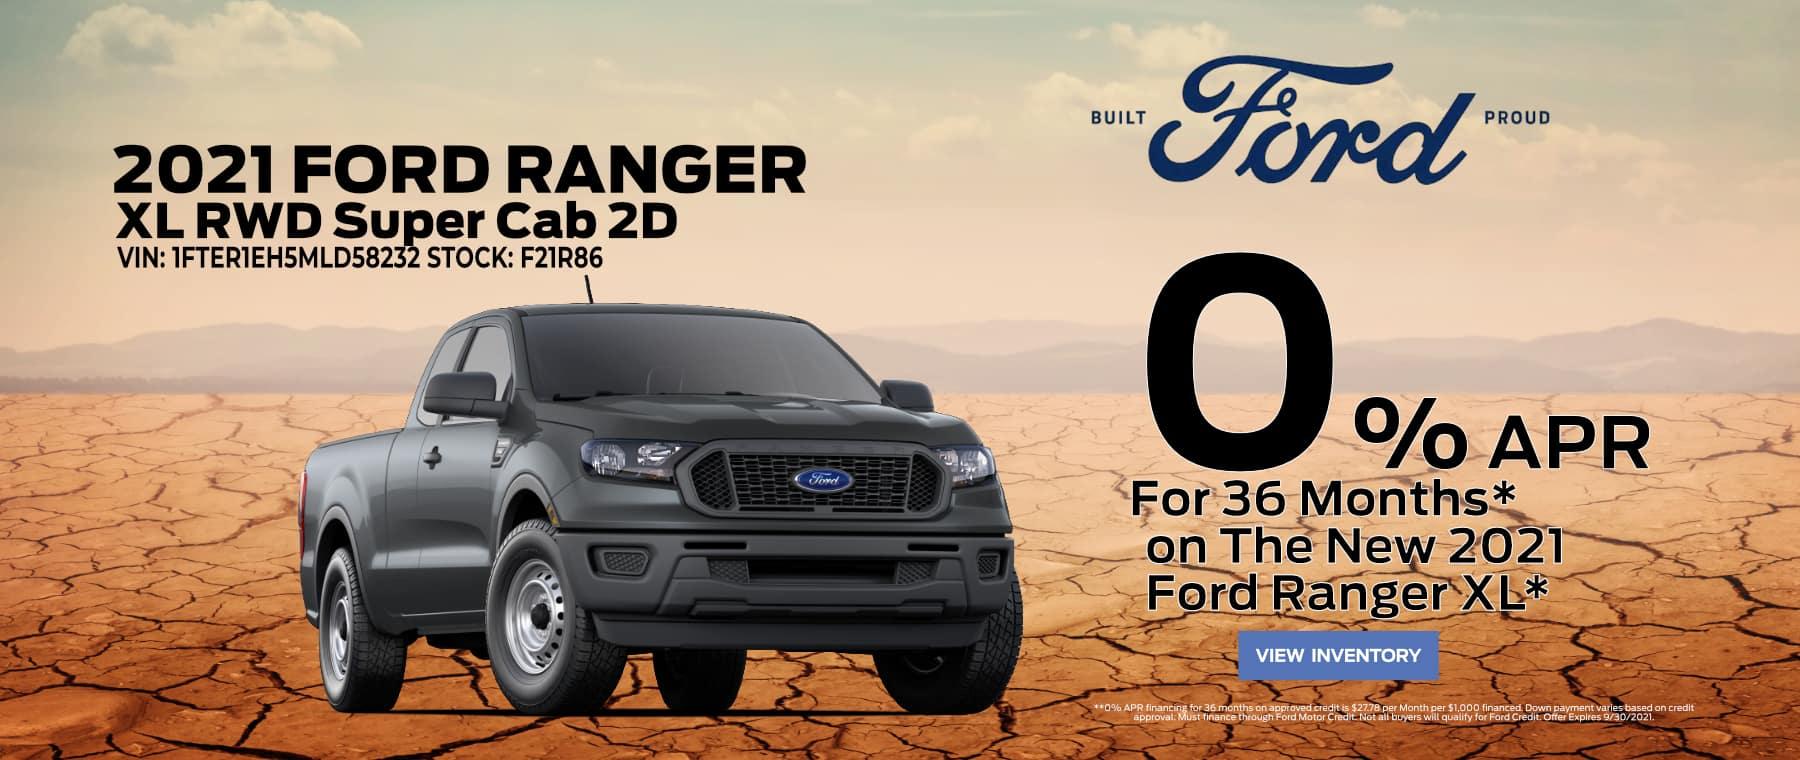 R_August_2021_F-150_Ranger_FF